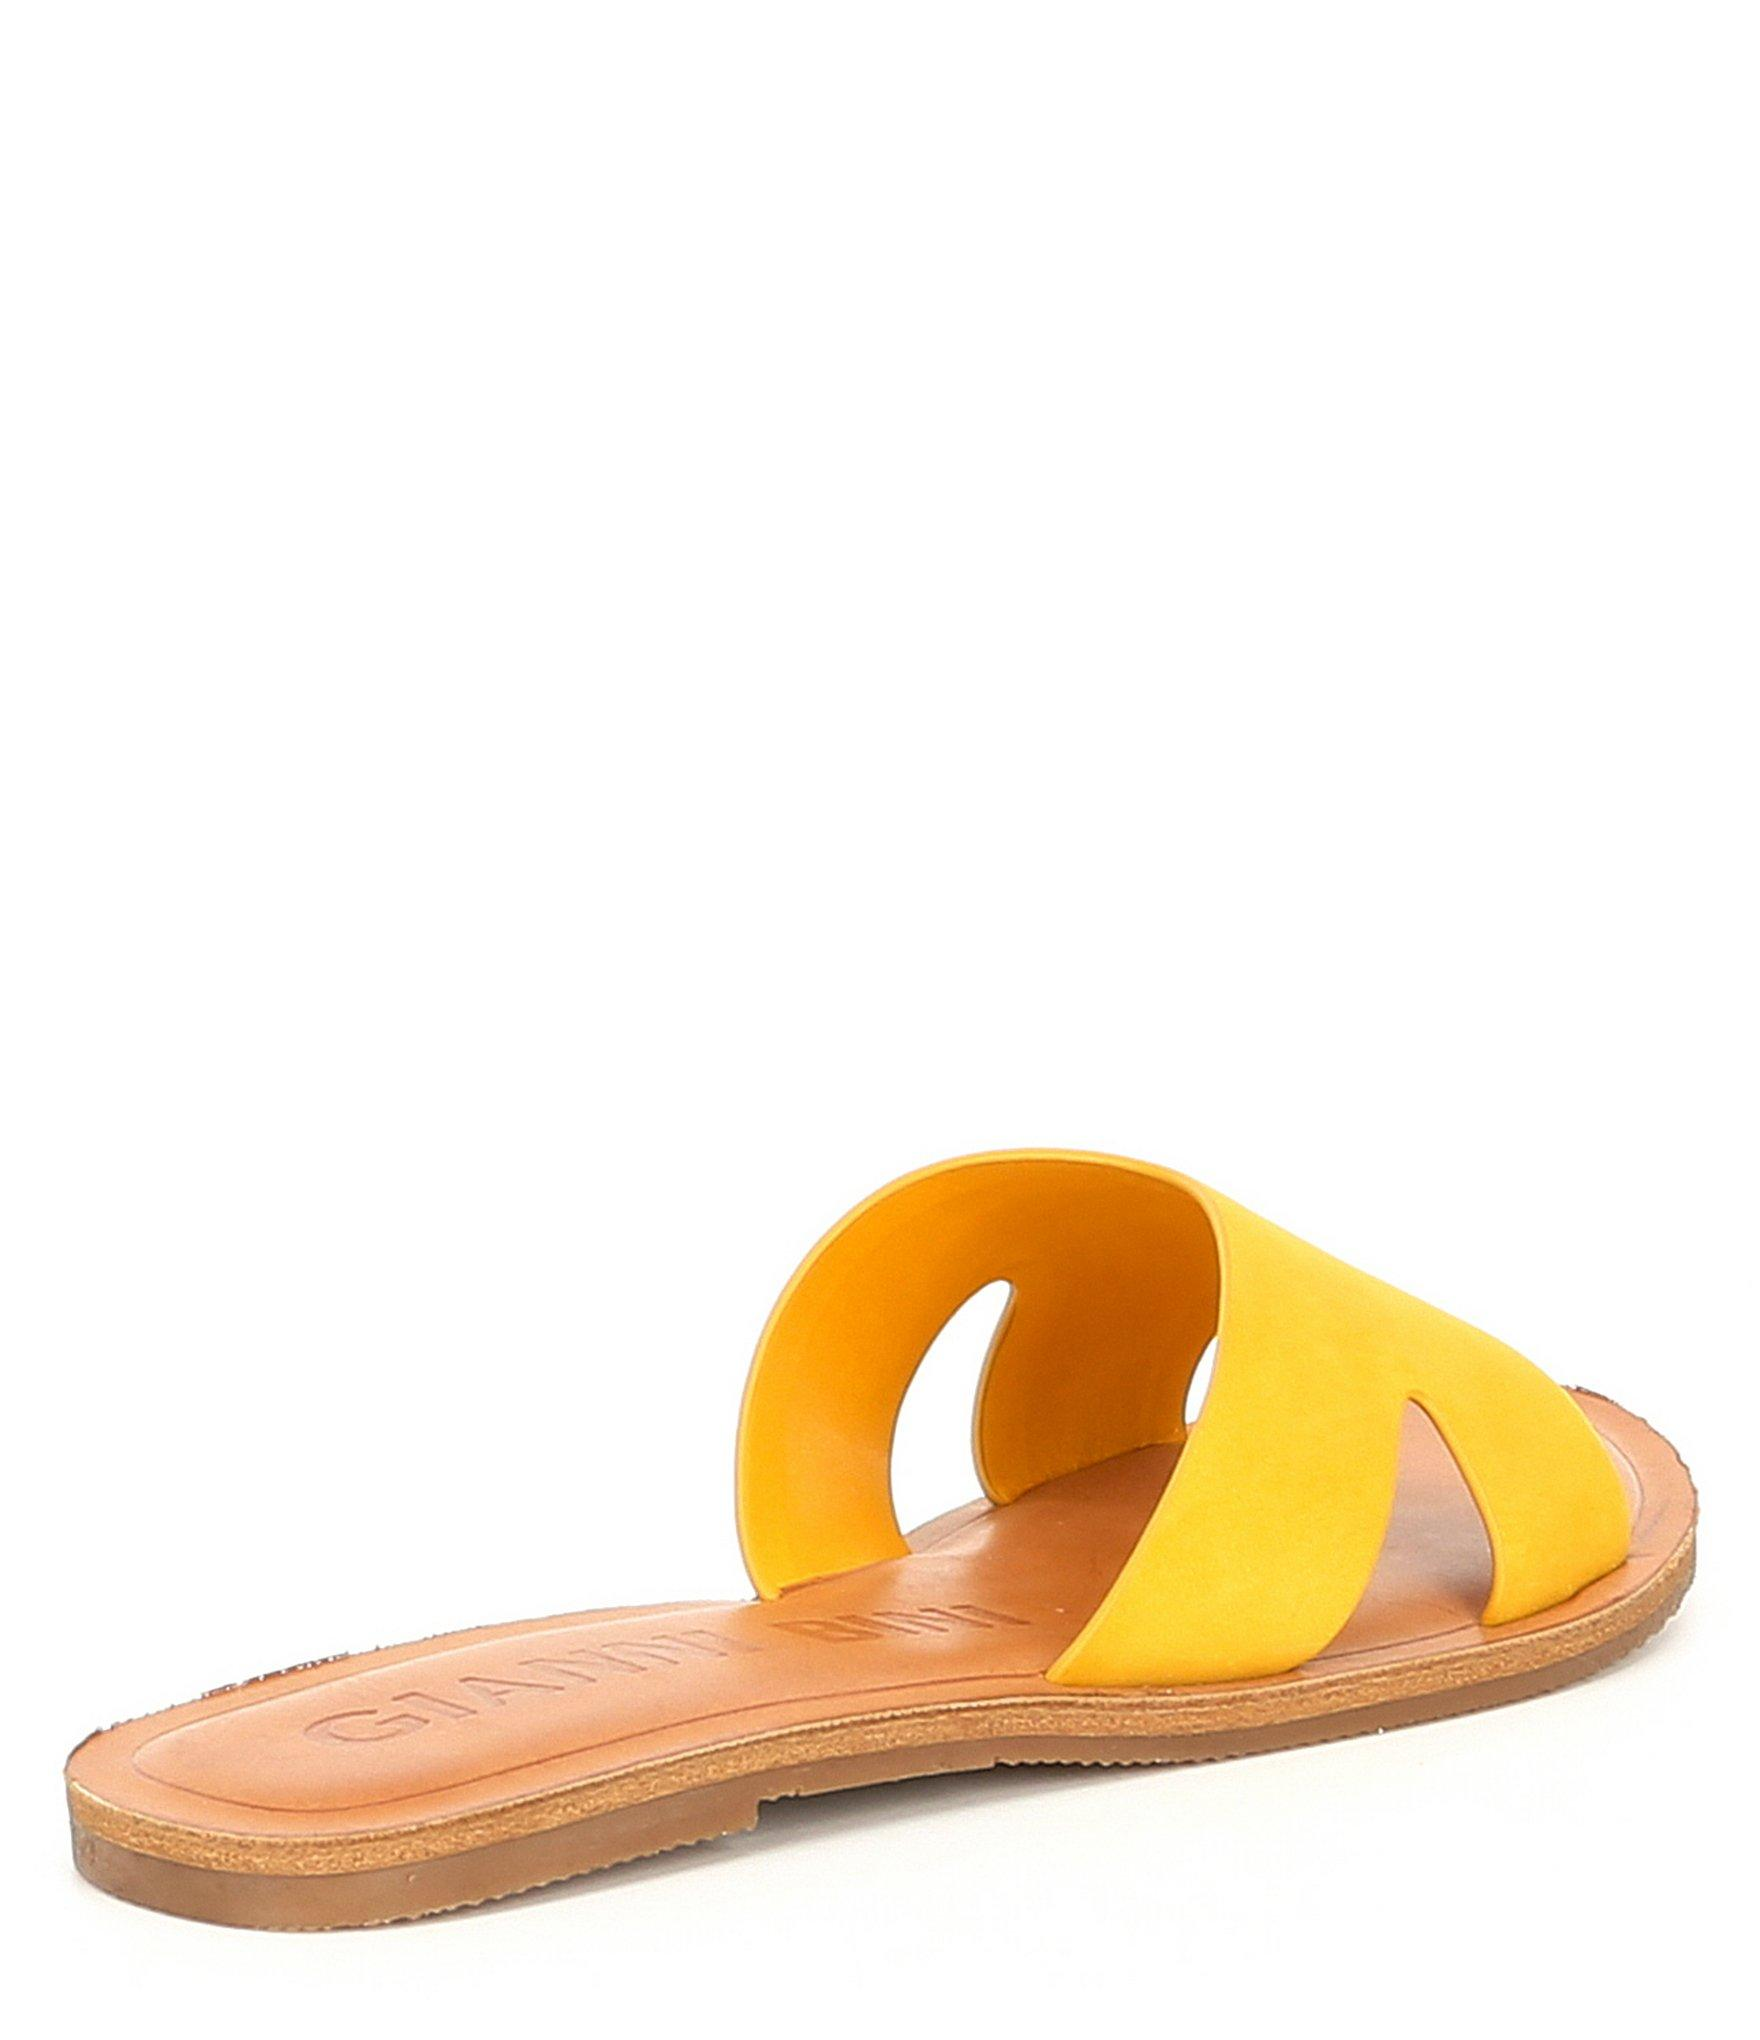 c4f0256f83f Lyst - Gianni Bini Stellie Nubuck Banded Slides in Yellow